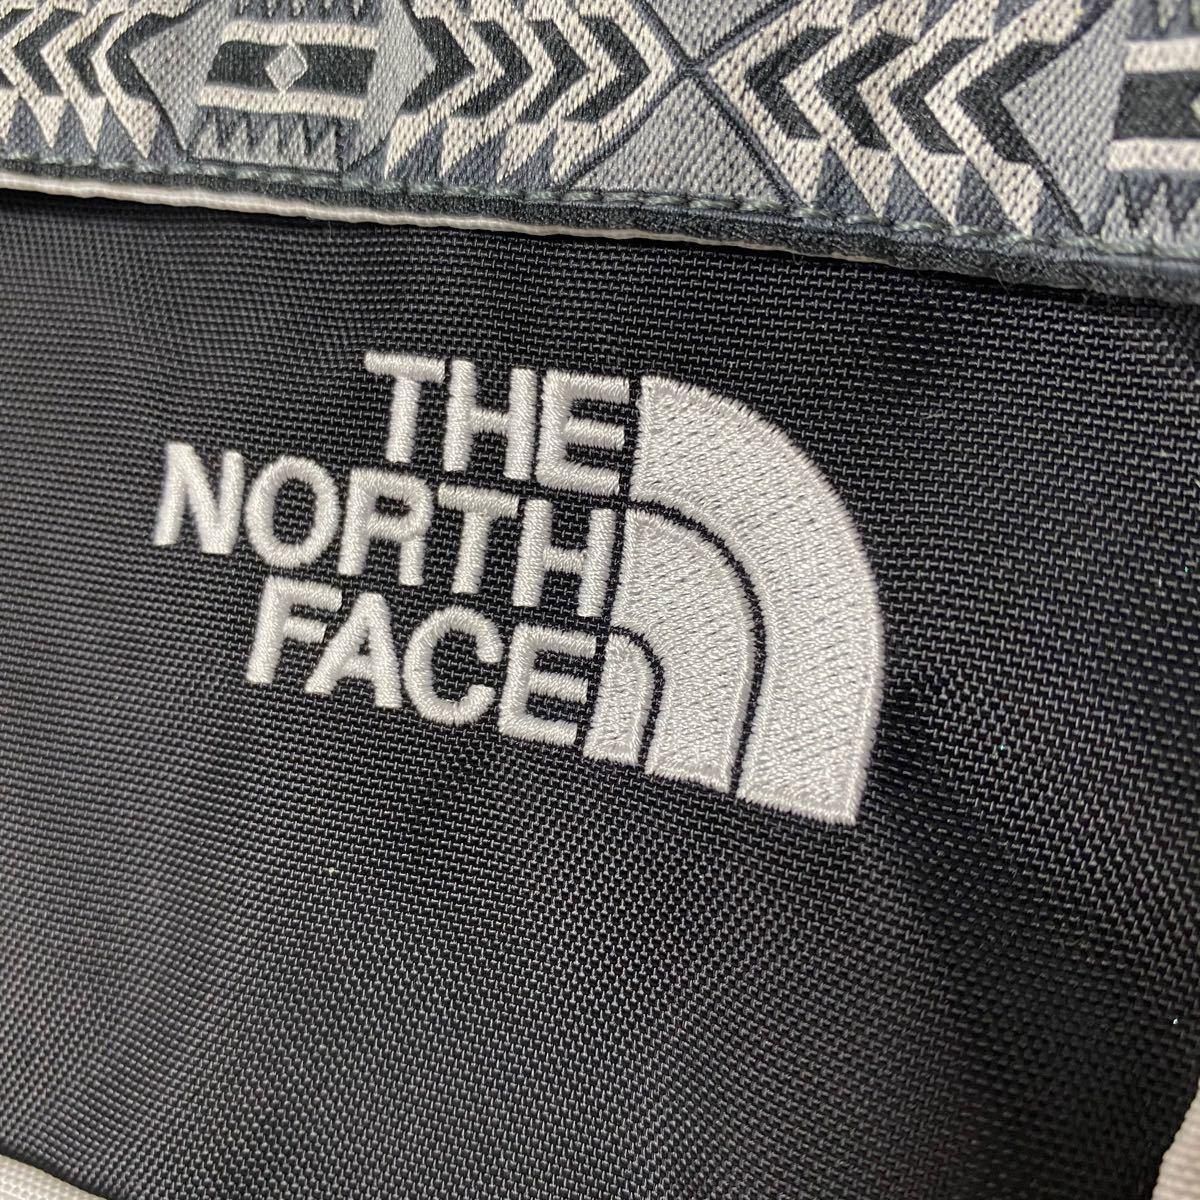 THE NORTH FACE ザノースフェイス ウエストバッグ ボディバッグ タグ付き